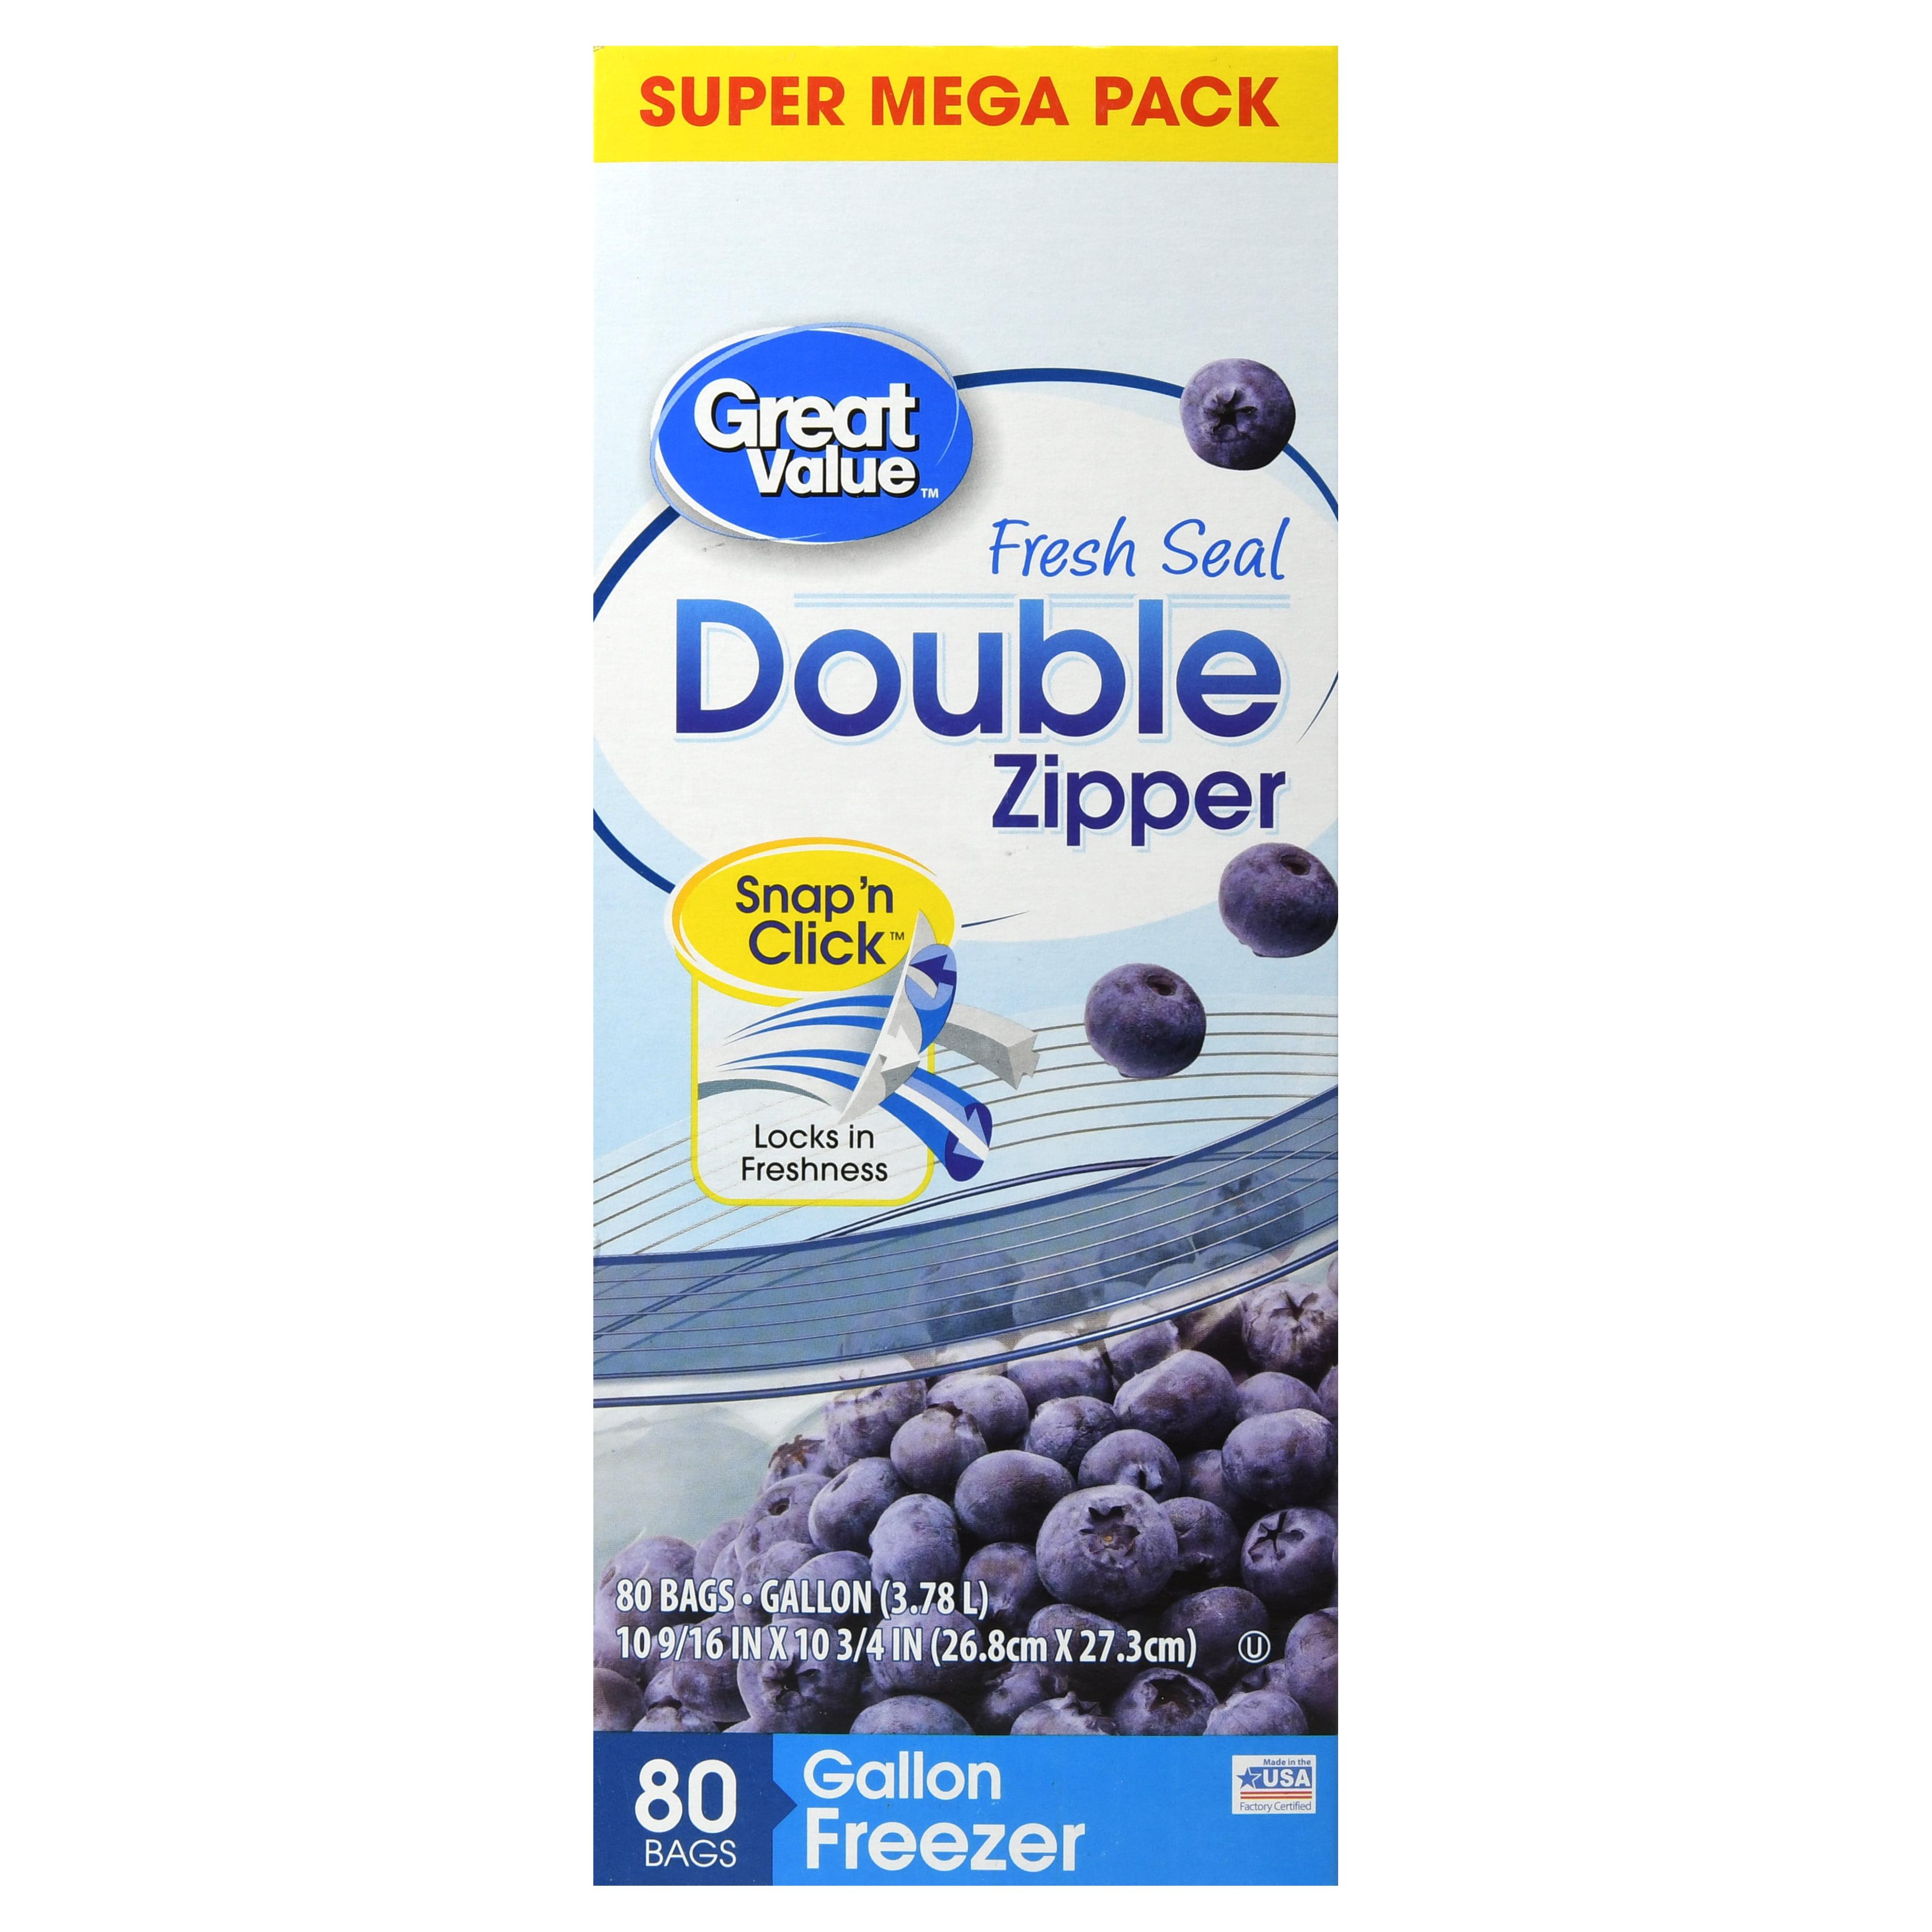 Great Value Double Zipper Freezer Bags, Gallon, 80 Count